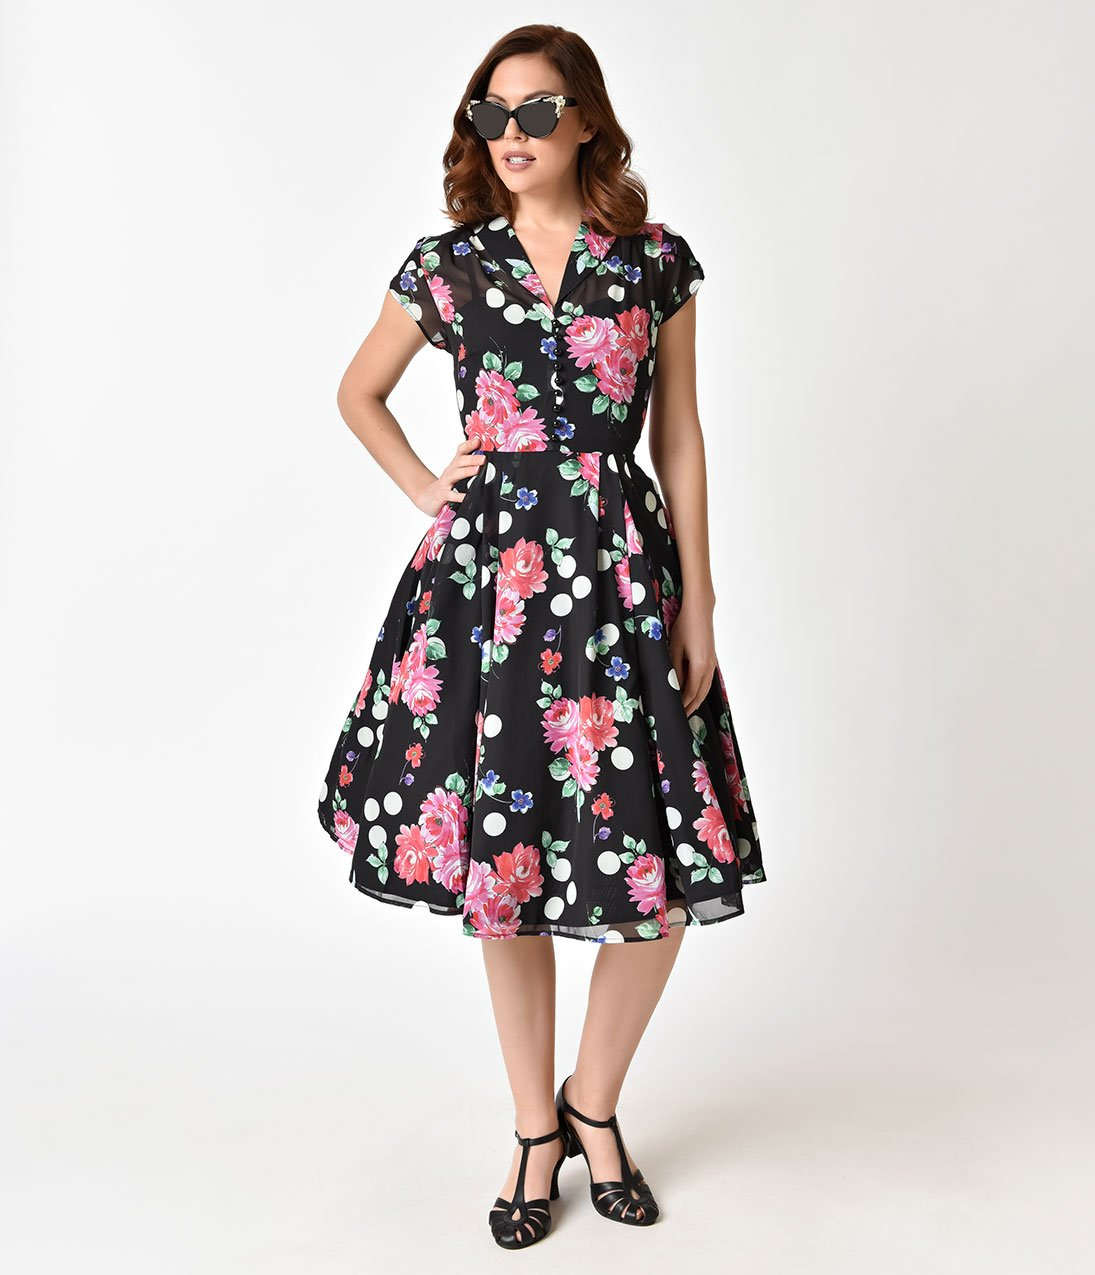 Hell_Bunny_1950s_Black_Floral_Cap_Sleeve_Bloomsbury_Chiffon_Swing_Dress_5_2048x2048.jpg